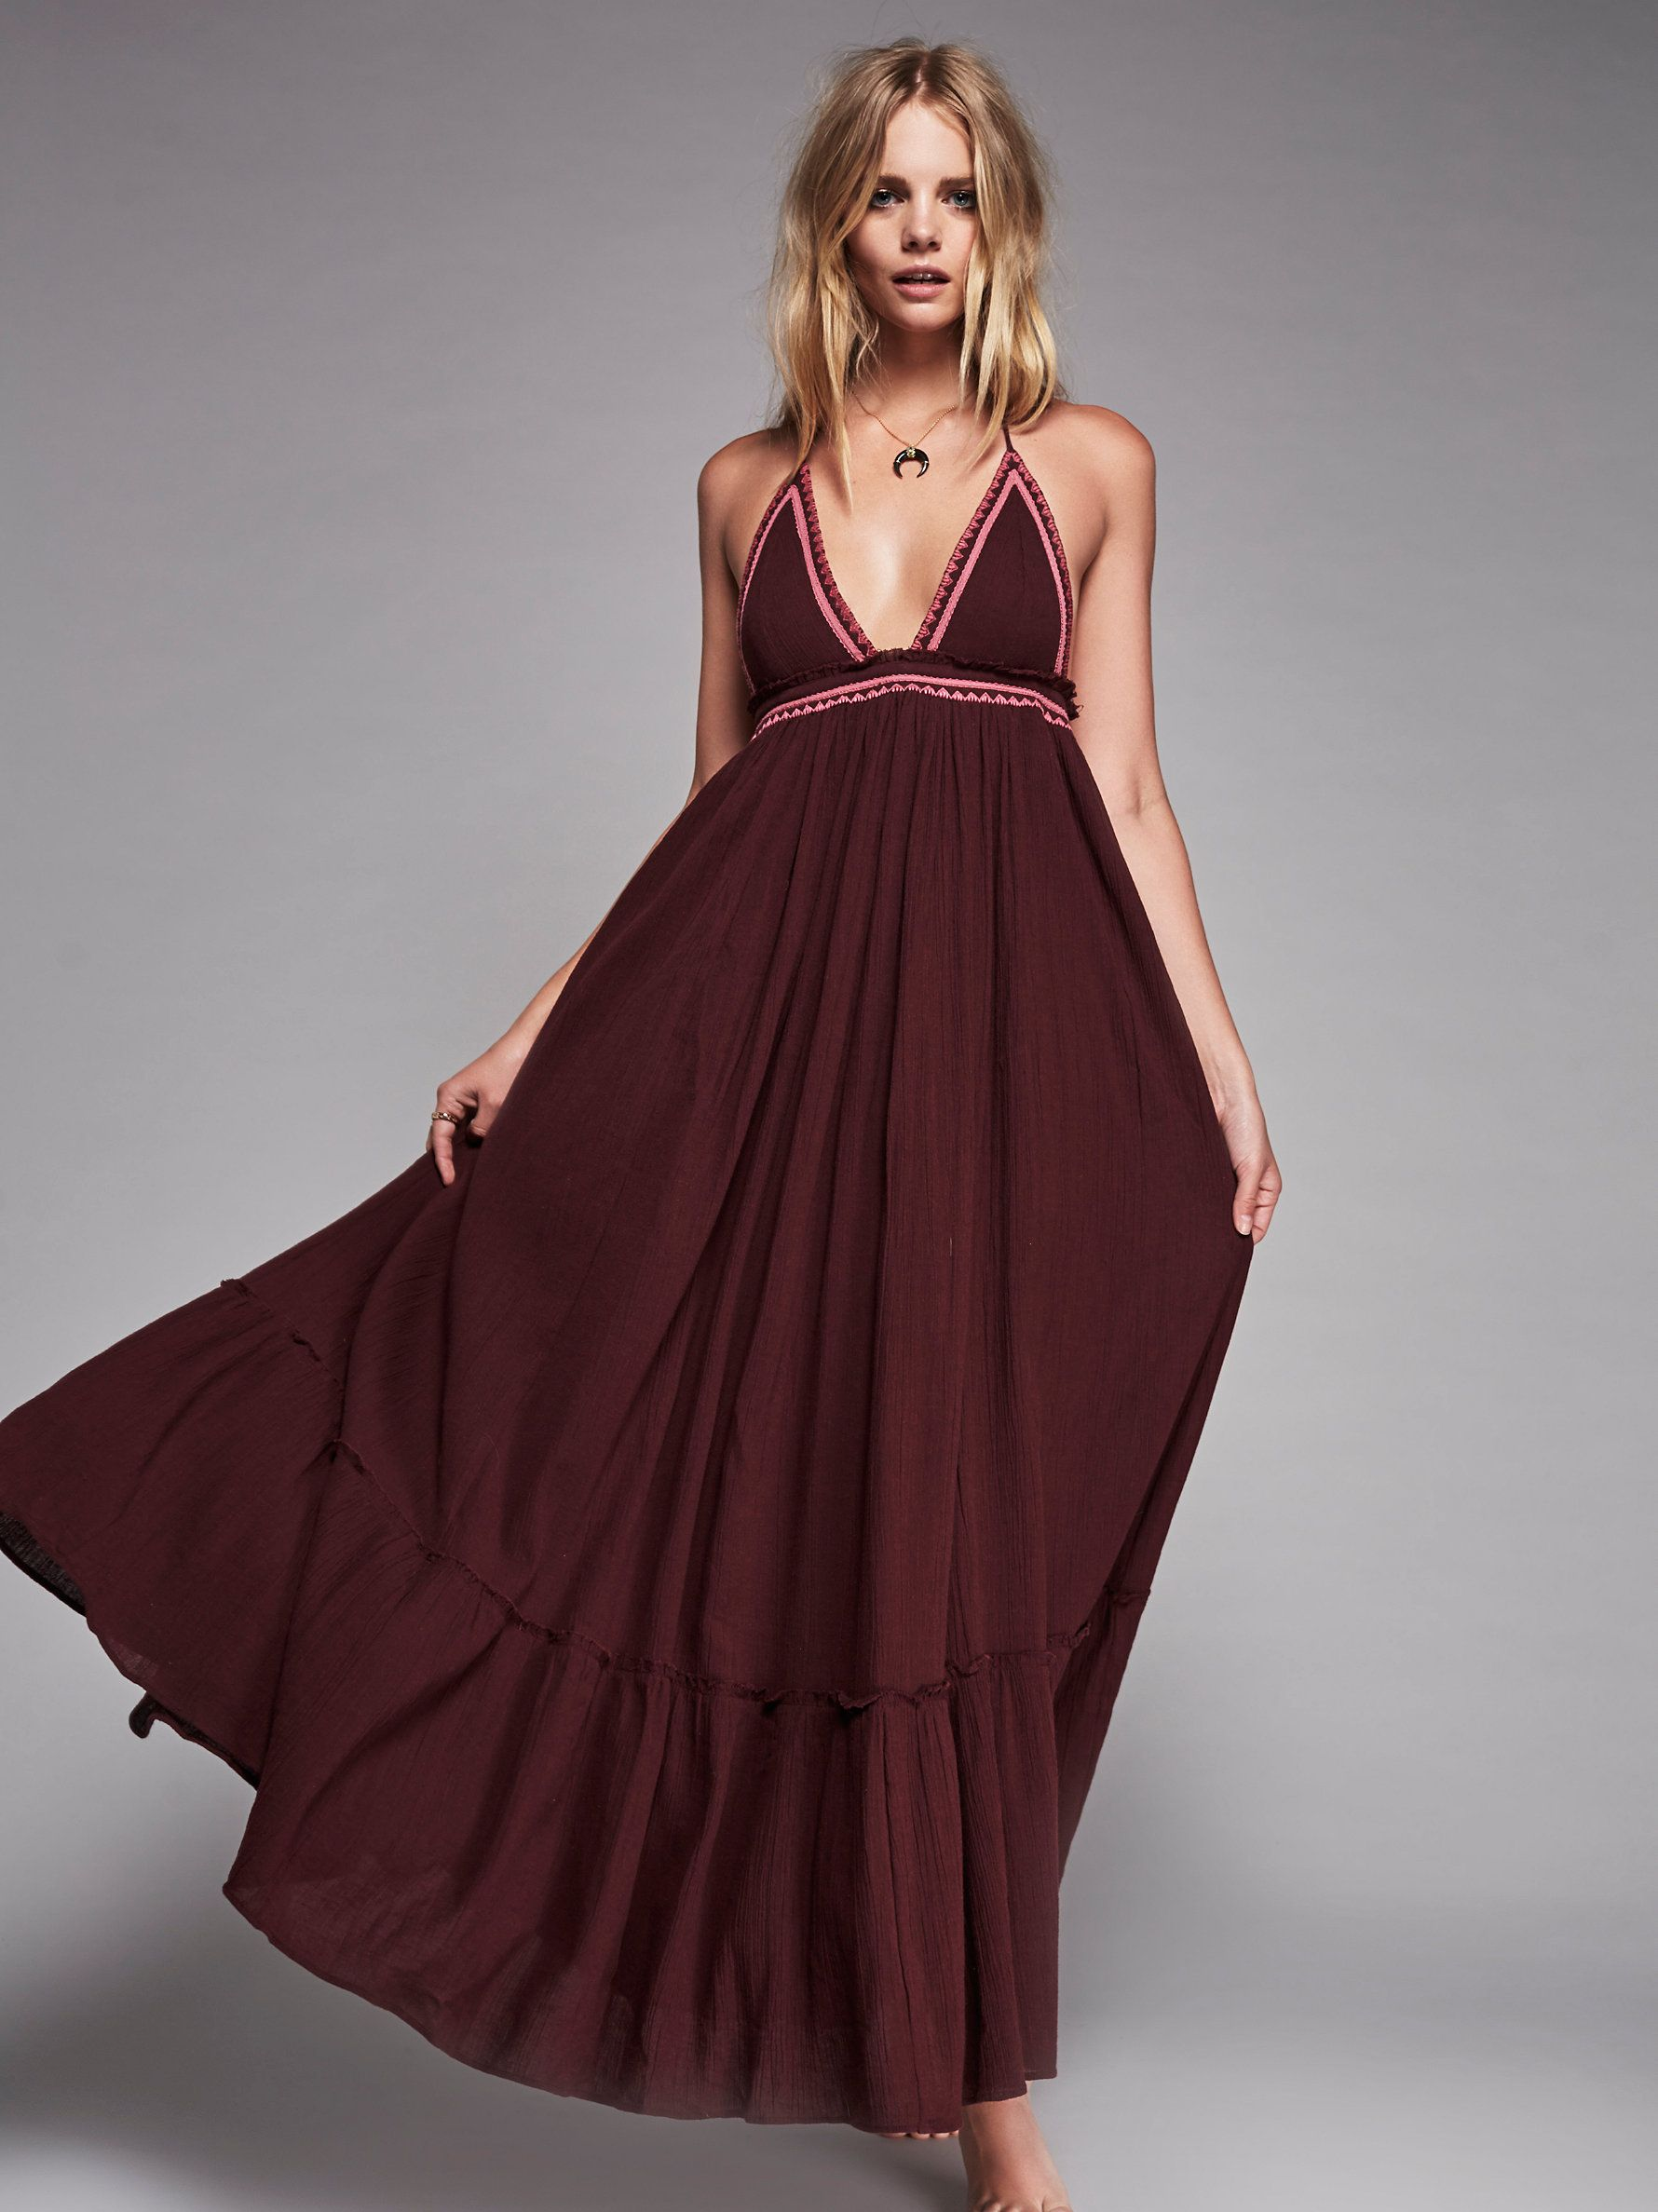 Love shakinu maxi crinkly cotton maxi dress featuring embroidery